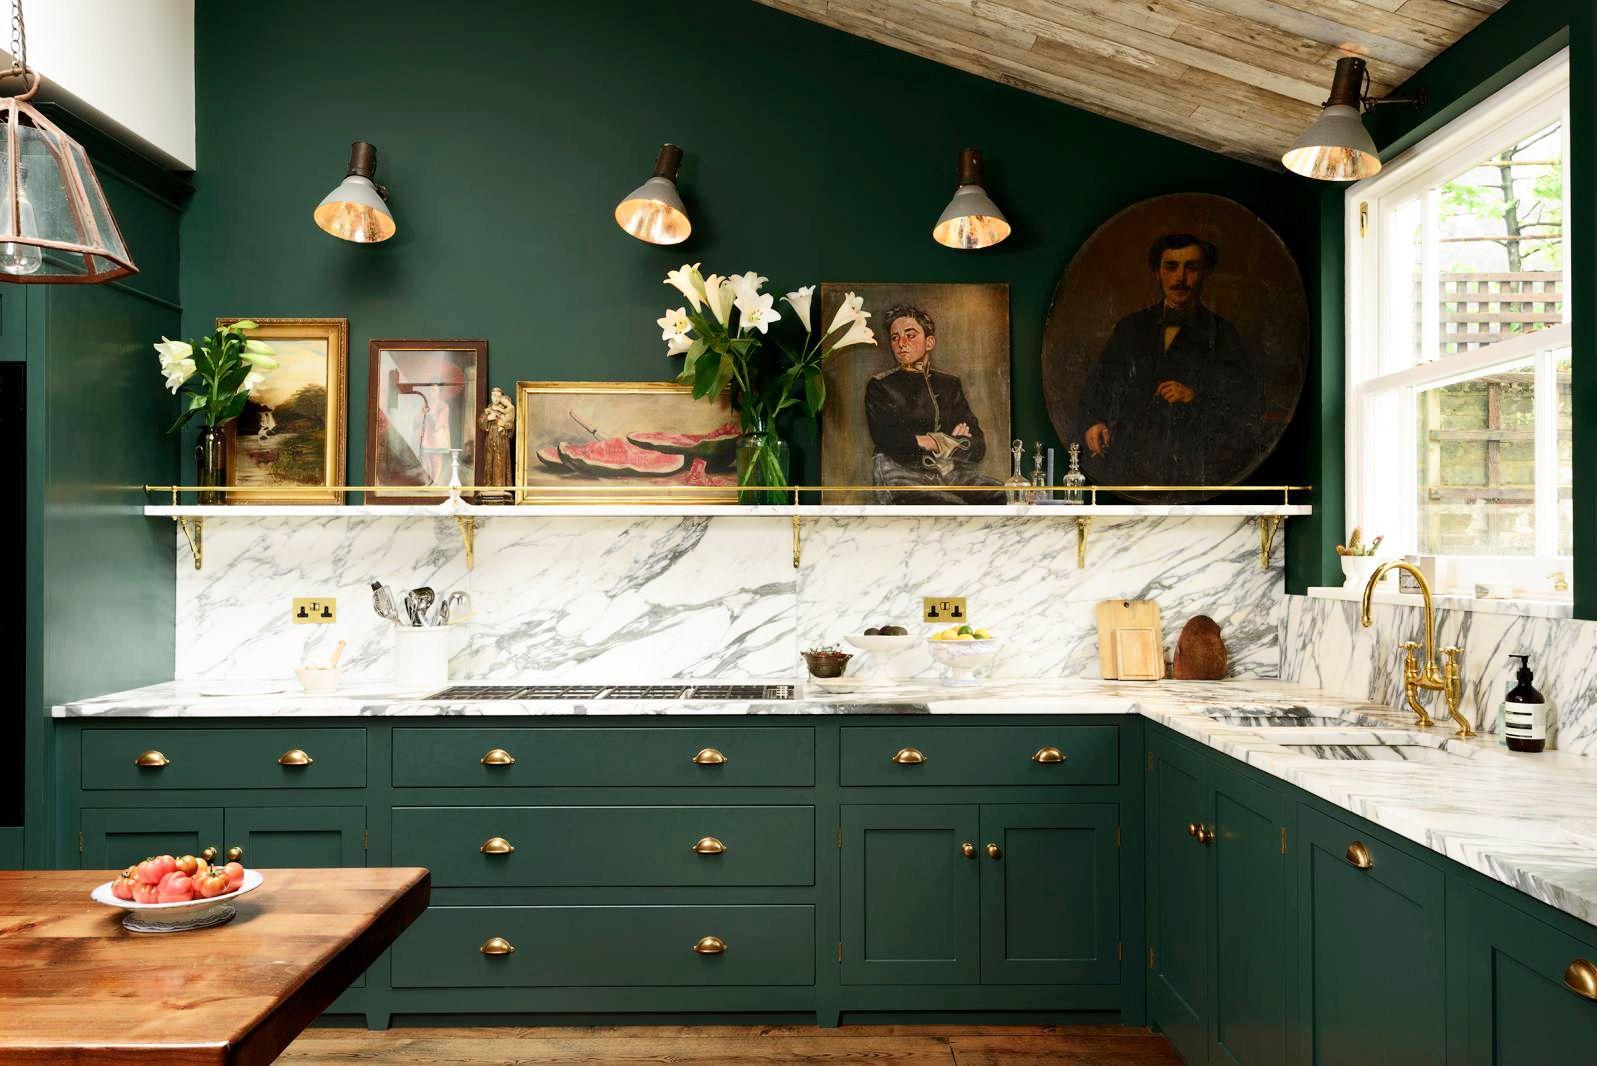 kitchen design ideas. deVOL Kitchens & 80 Kitchen Design \u0026 Remodeling Ideas - Pictures of Beautiful Kitchens